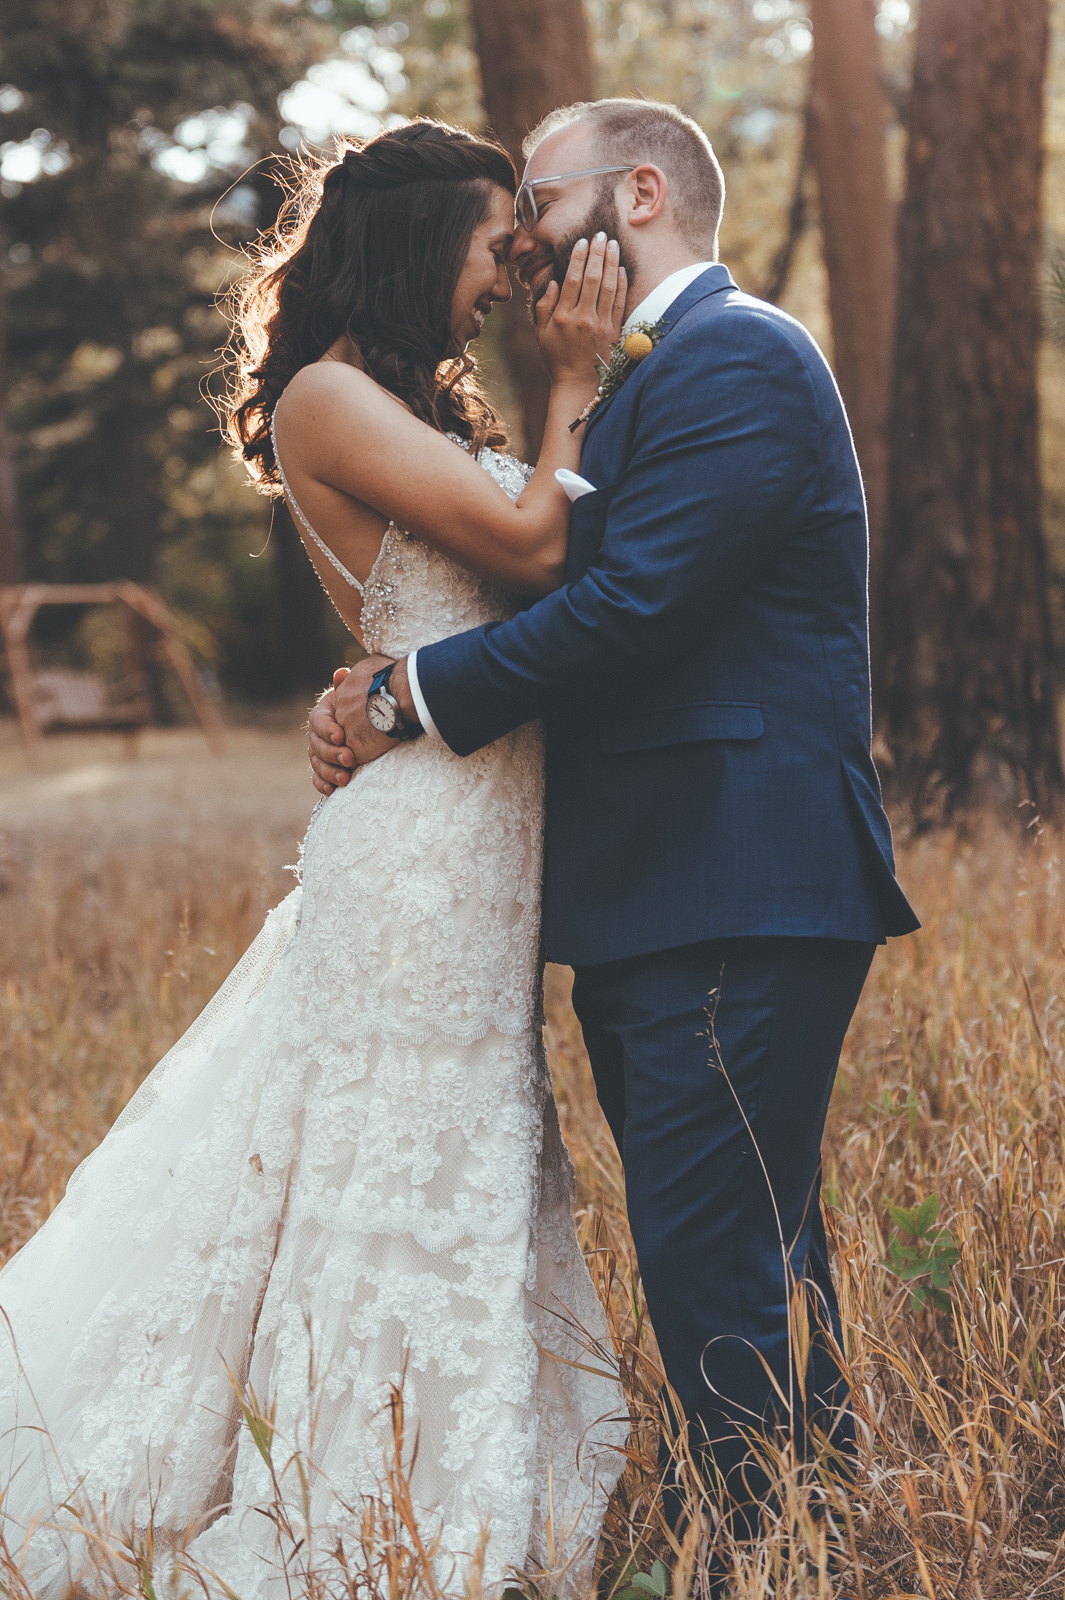 ChadFahnestockPhotography-estes-park-wedding-photography-042.jpg